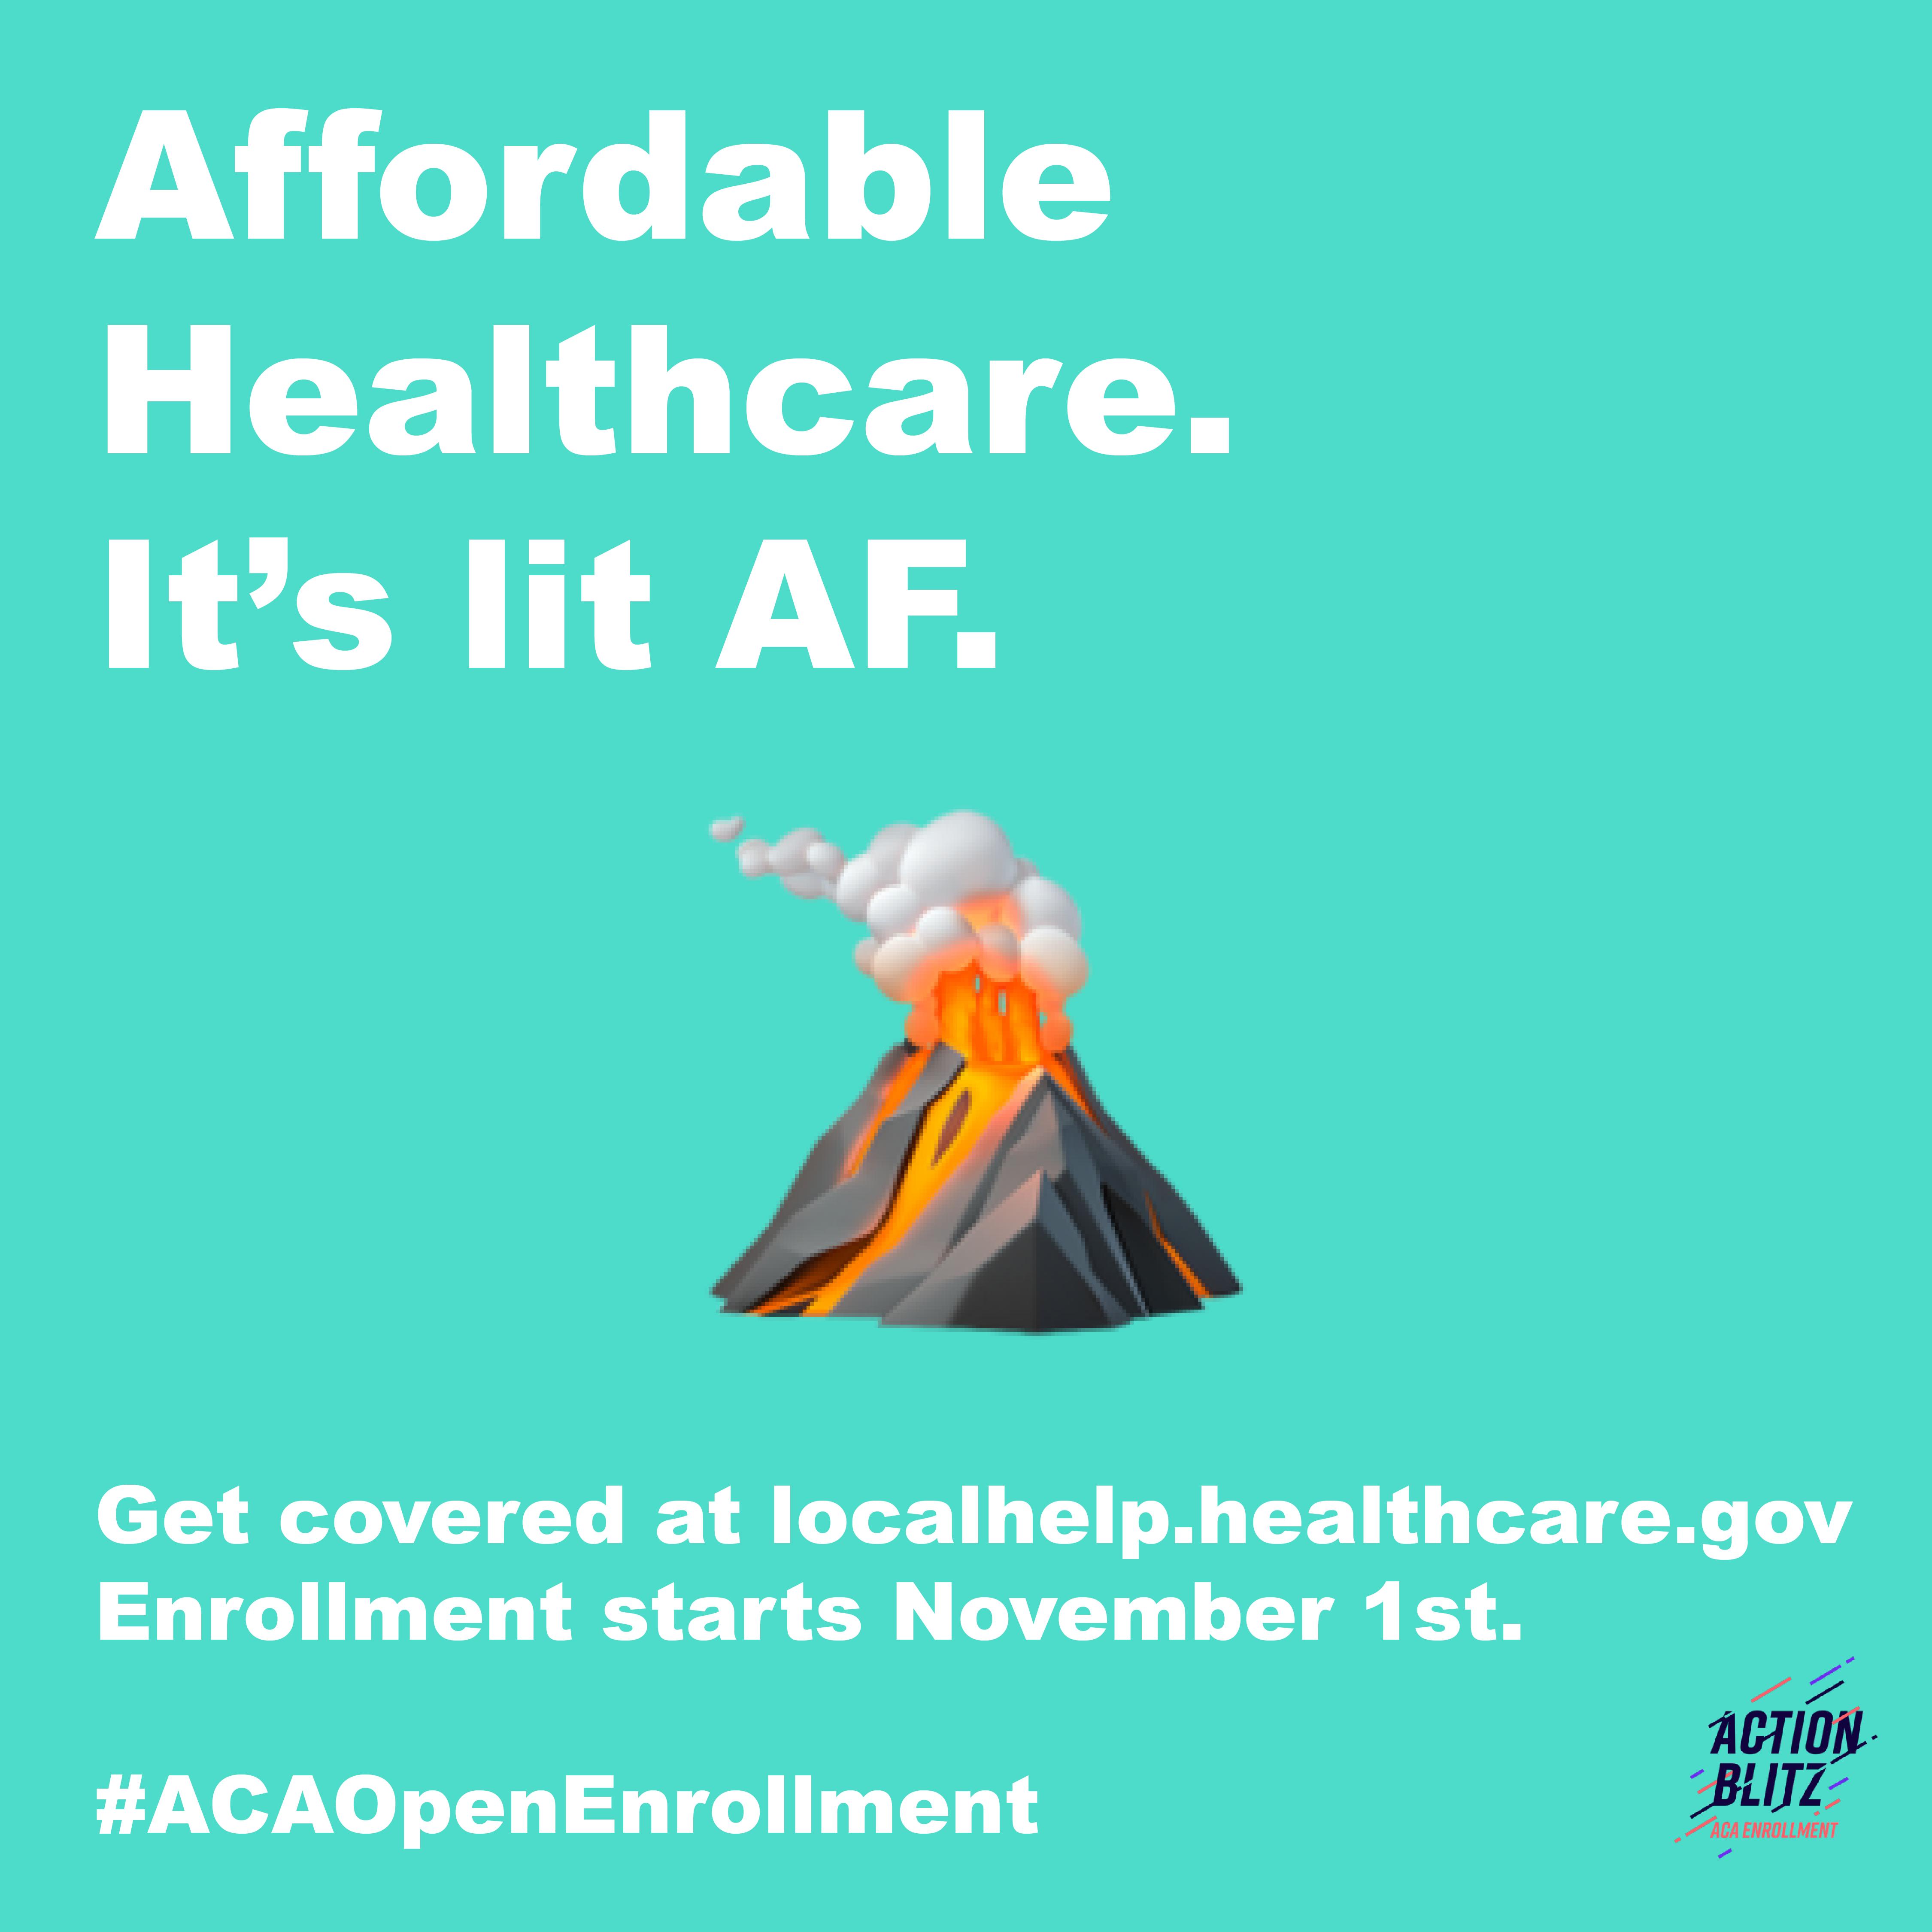 Instagram ACA Enrollment Emoji Campaign